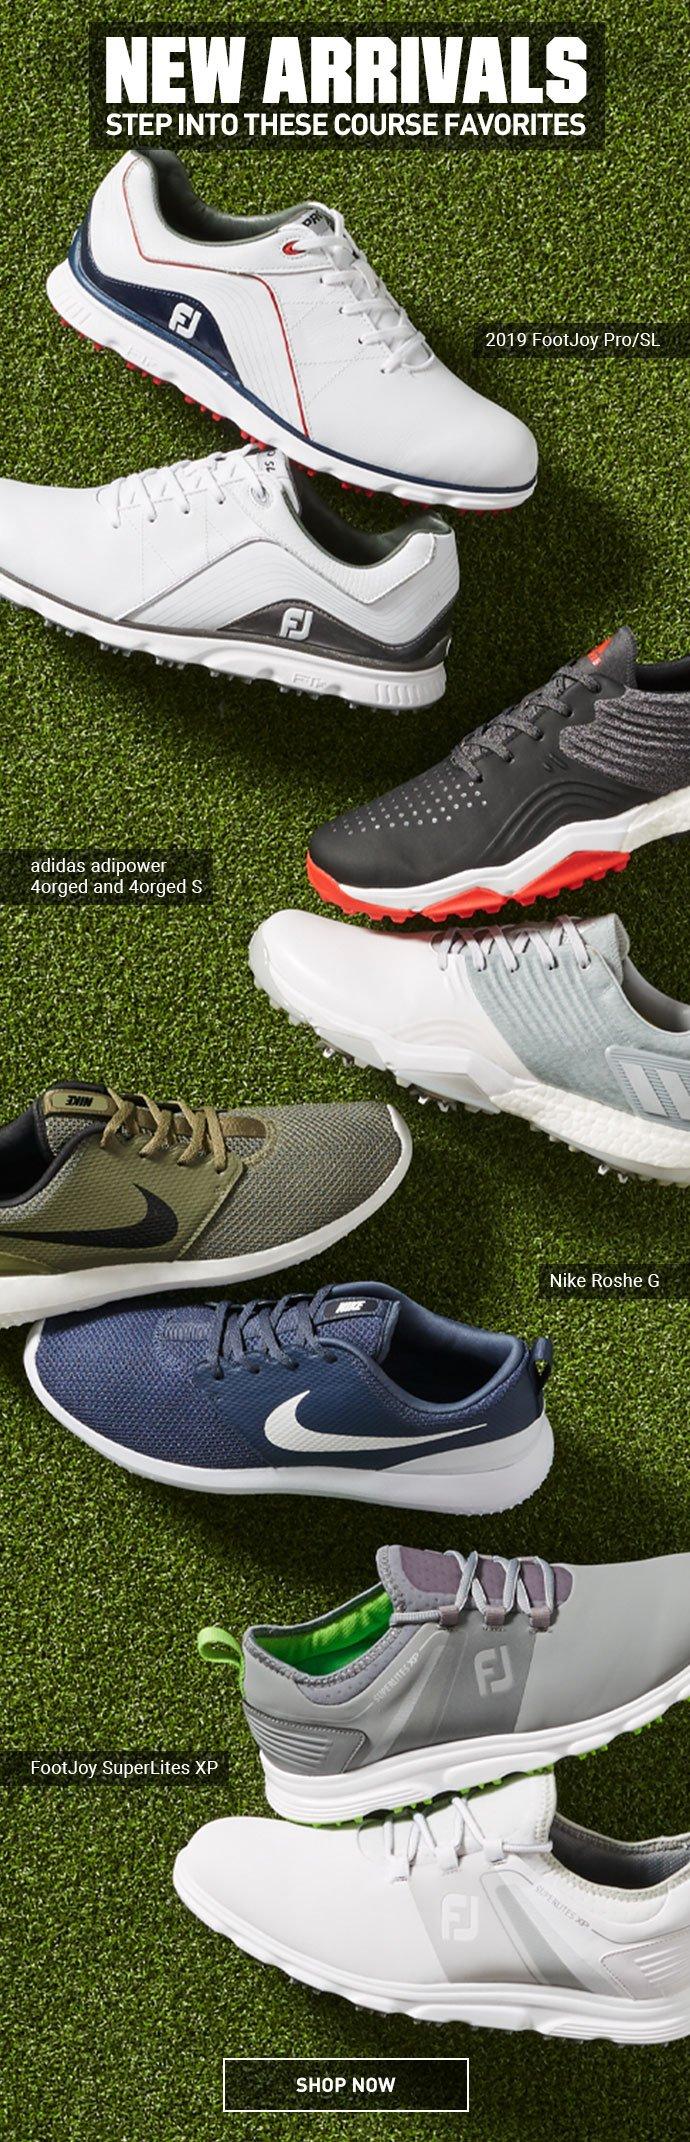 Golf Shoes from FootJoy, adidas \u0026 Nike